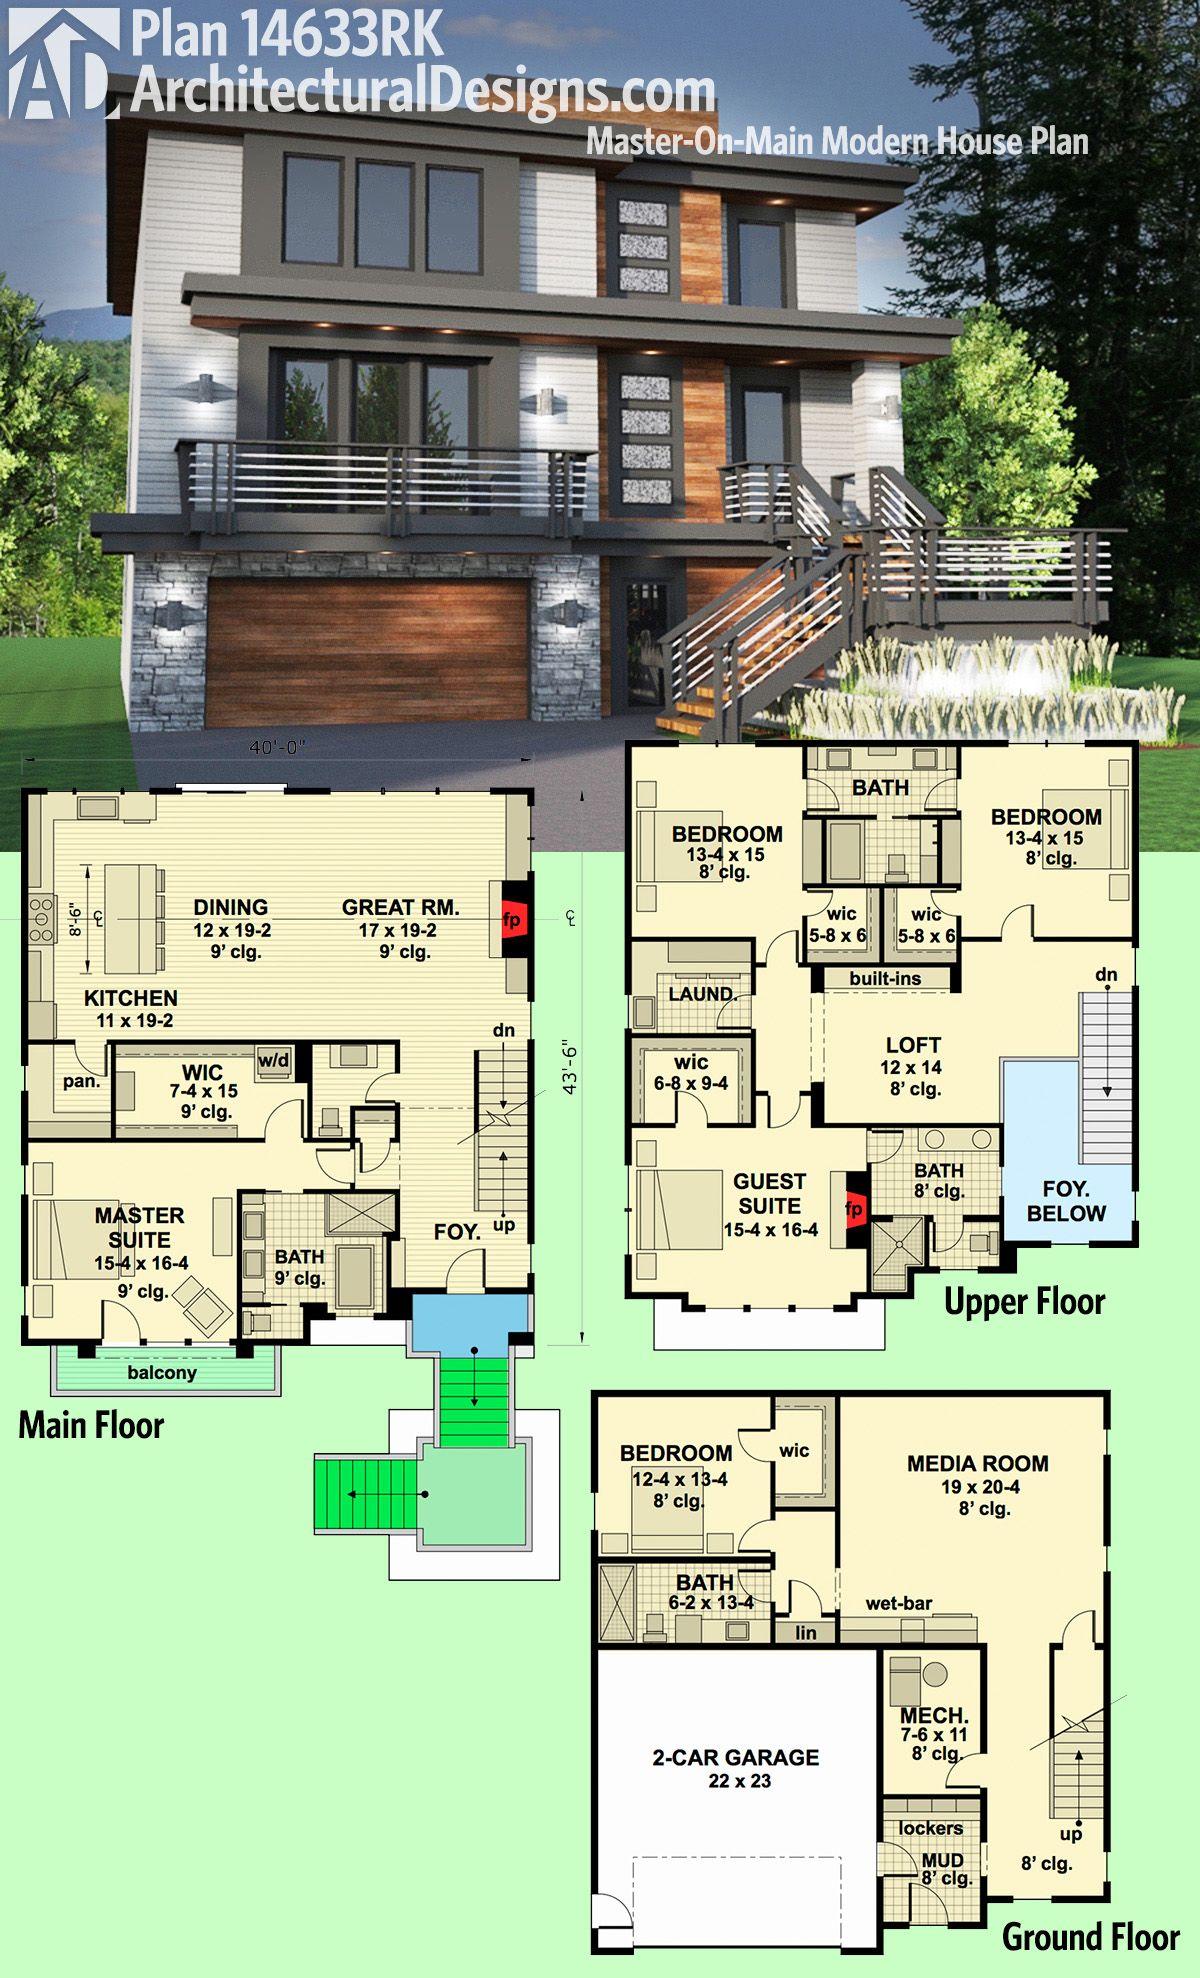 Plan 14633rk Master On Main Modern House Plan House Blueprints Modern House Plan Modern House Floor Plans